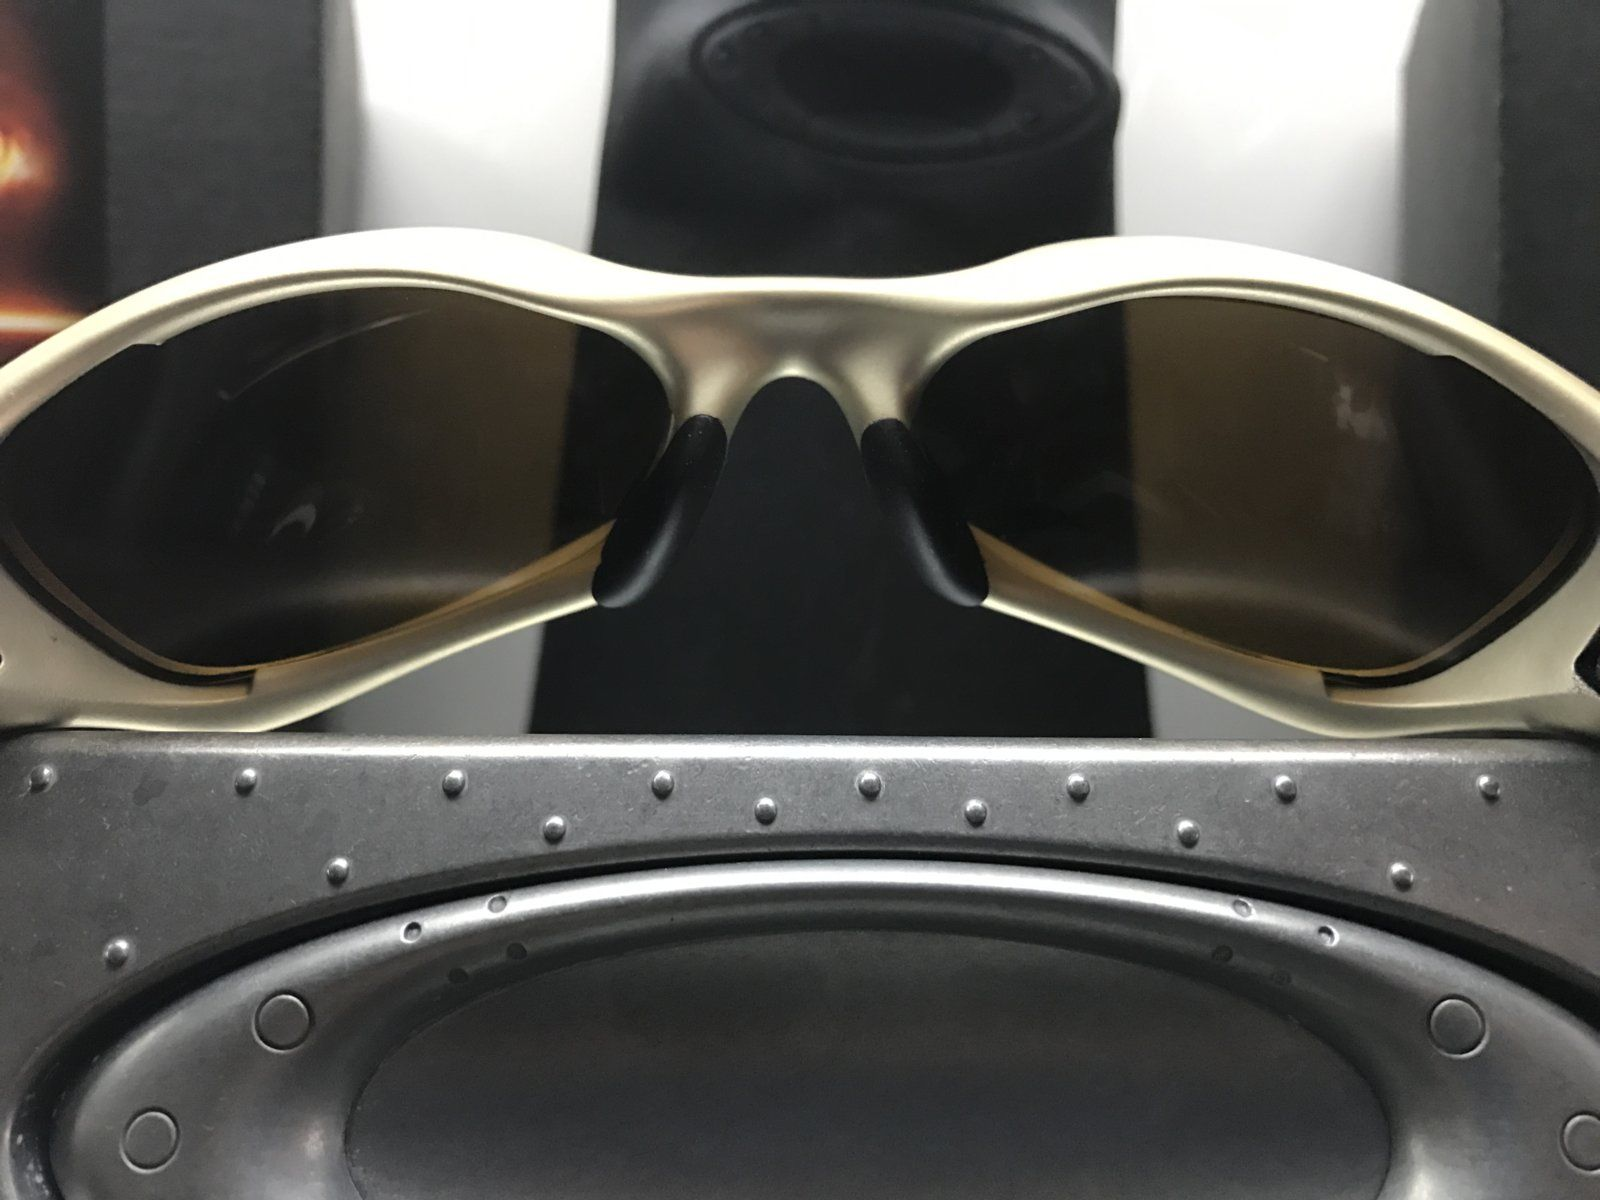 Valve FMJ Platinum - FMJ+ w/ gold iridium - $110 - IMG_6351.JPG